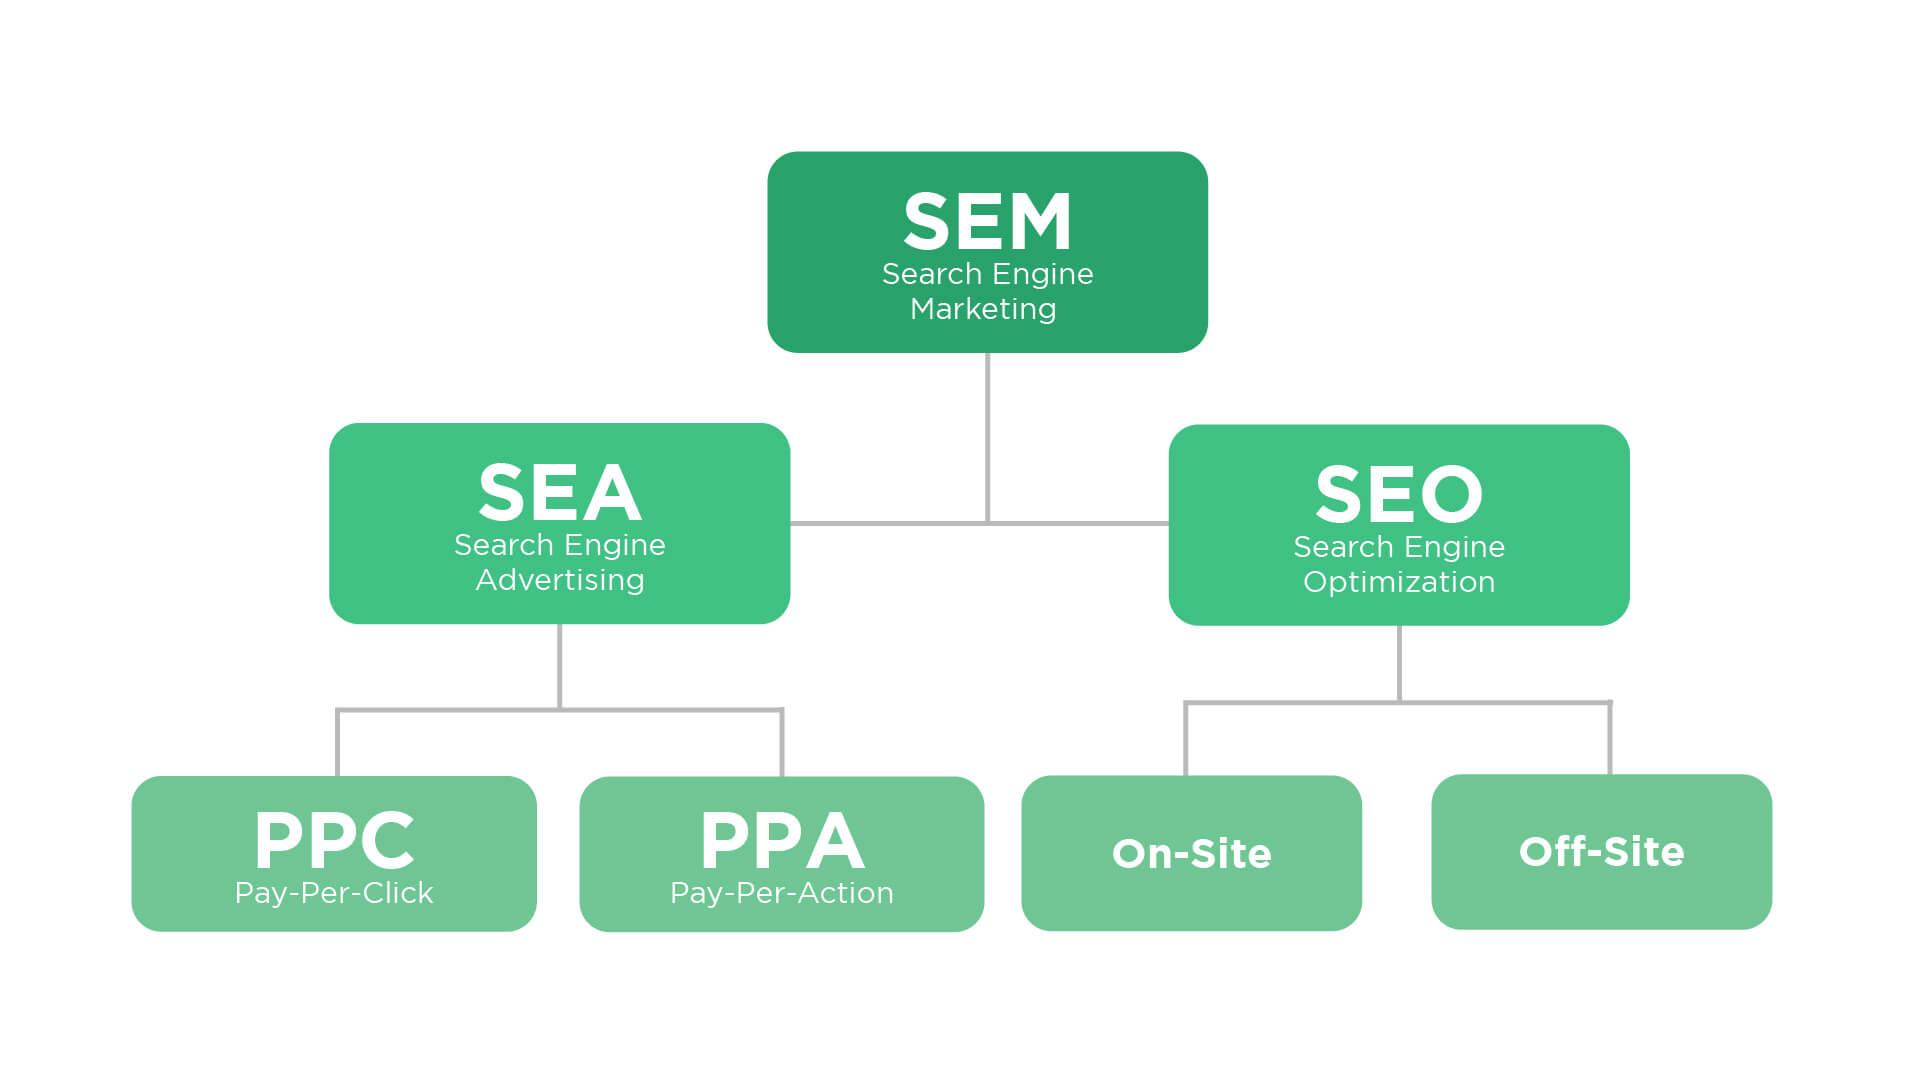 SEM SEA SEO PPC PPA On-site Off-site Comparison tree diagram by Mooc Creative